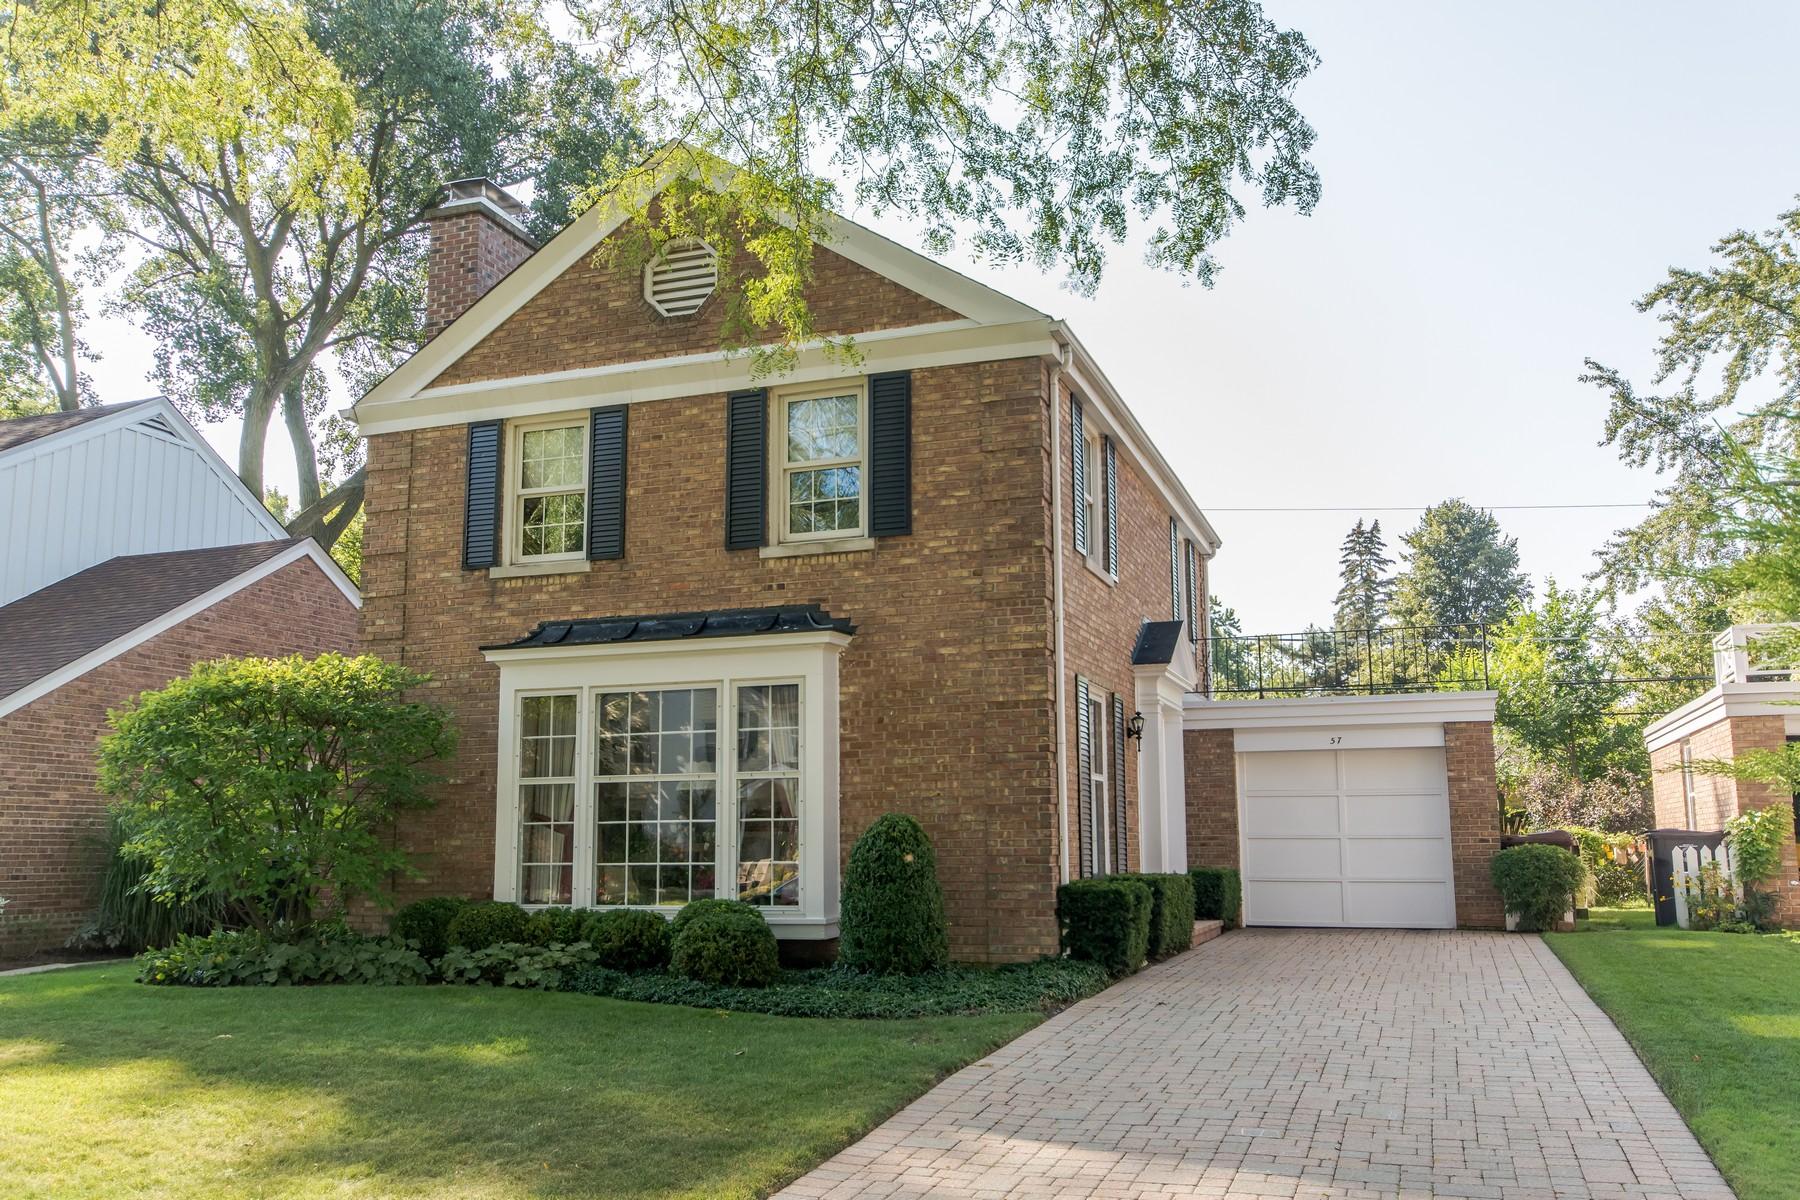 Villa per Vendita alle ore Gracious living in lovely brick colonial 57 Salem Lane, Evanston, Illinois, 60203 Stati Uniti